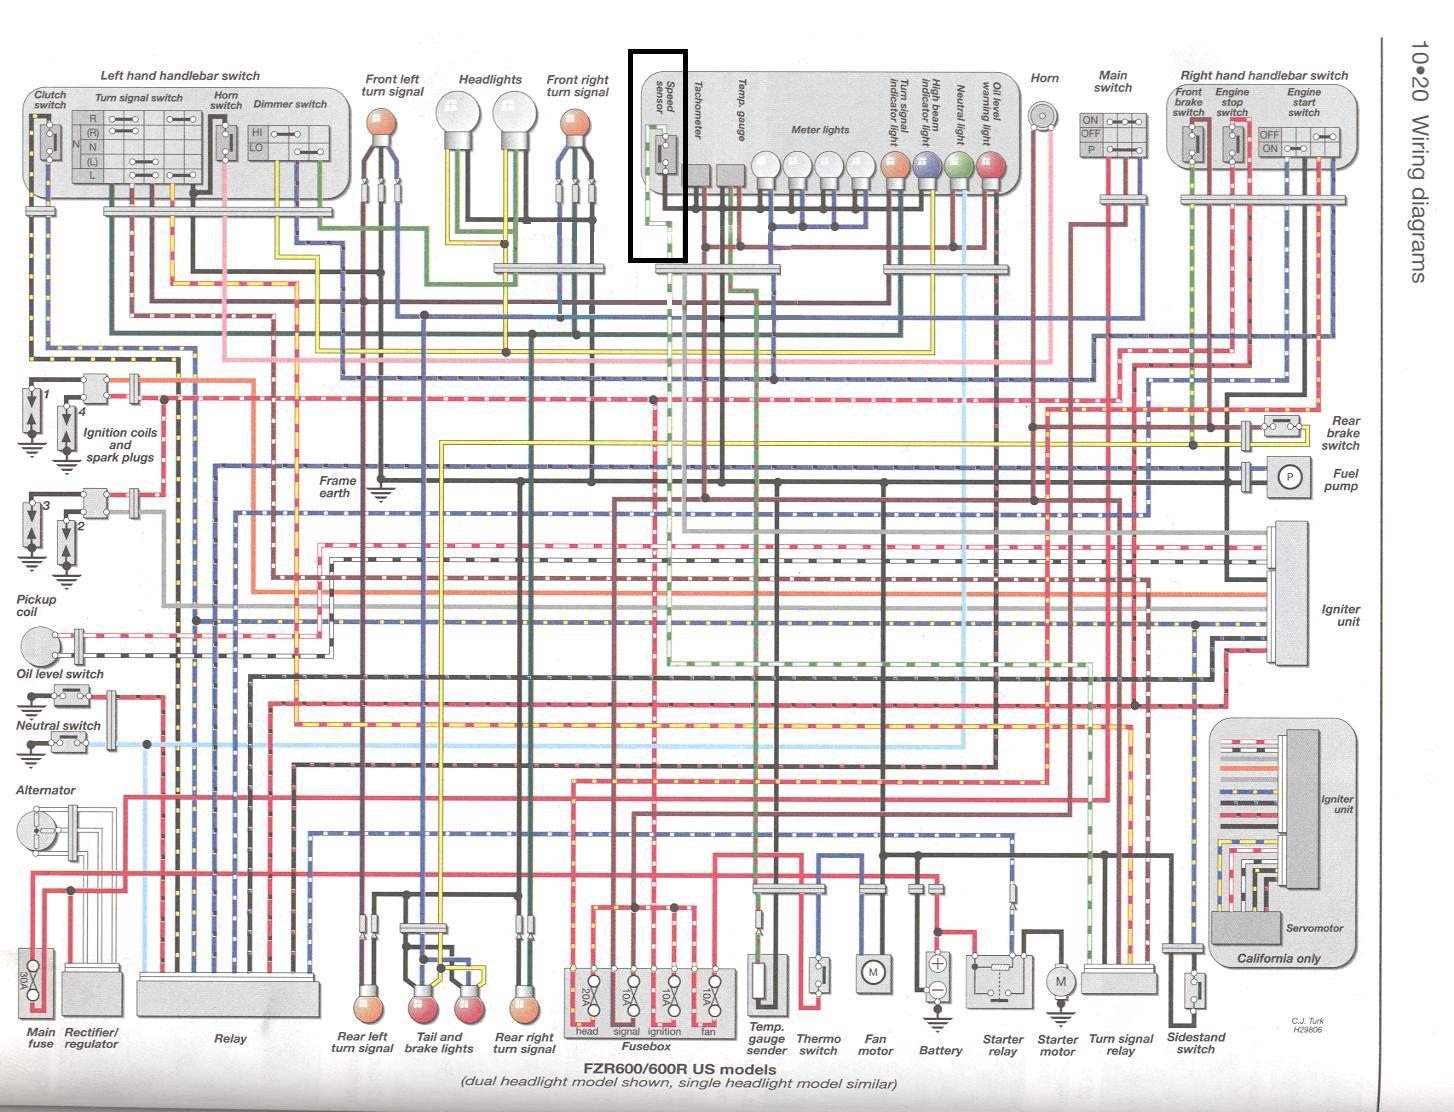 fzr600?resize\\=665%2C509 1993 honda shadow 1100 wiring diagram vt700 wiring diagram, 1979 Basic Electrical Wiring Diagrams at bakdesigns.co